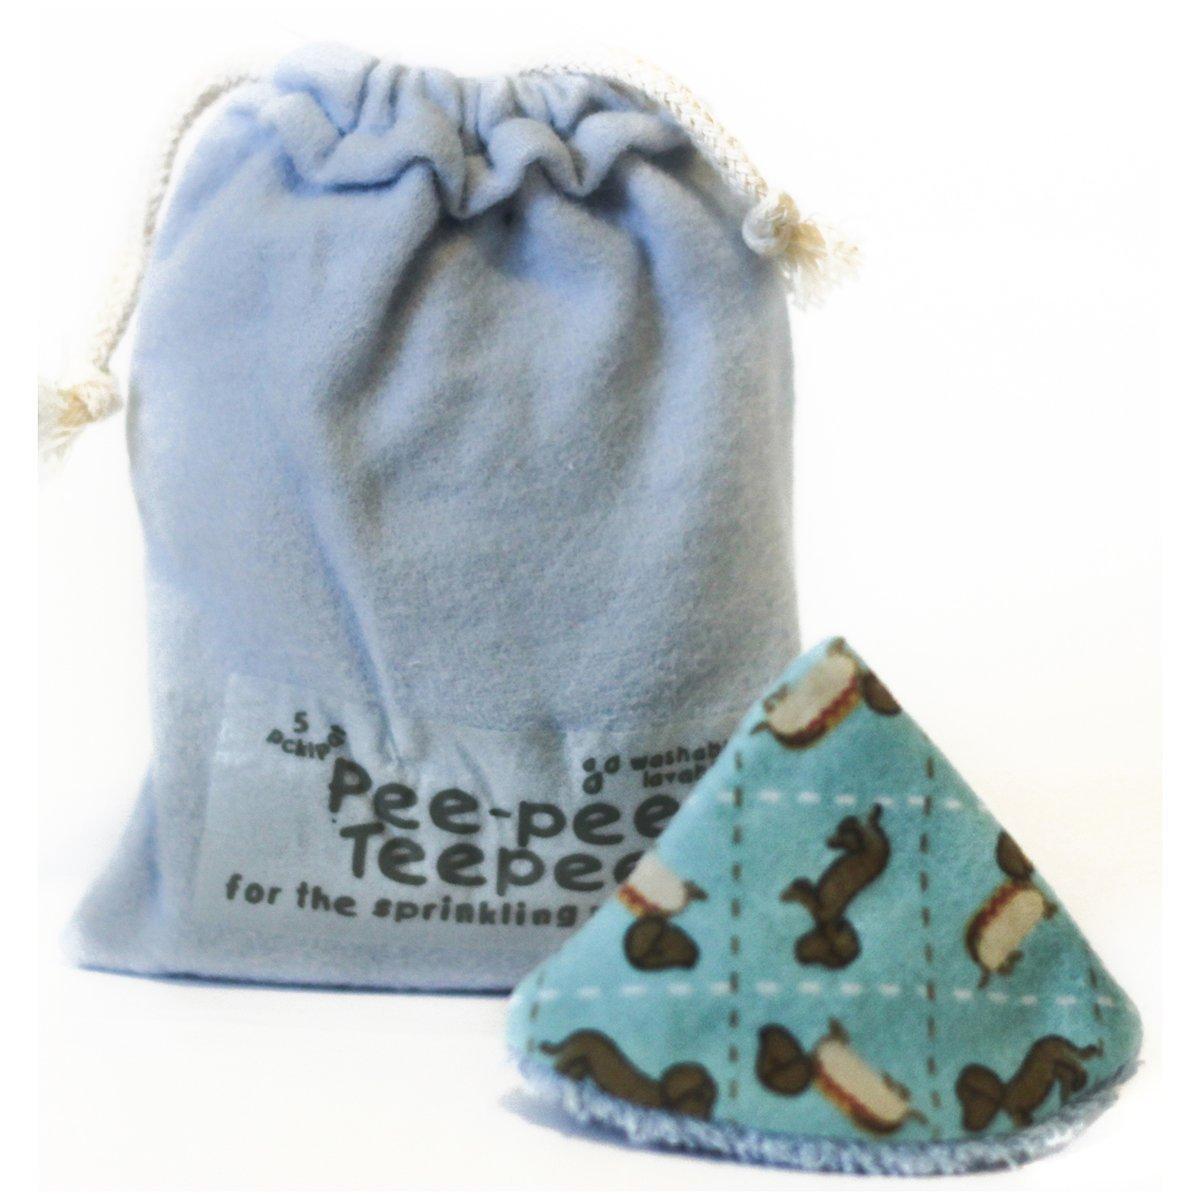 Pee-pee Teepee Wiener Dog Blue - Laundry Bag Beba Bean PT3092